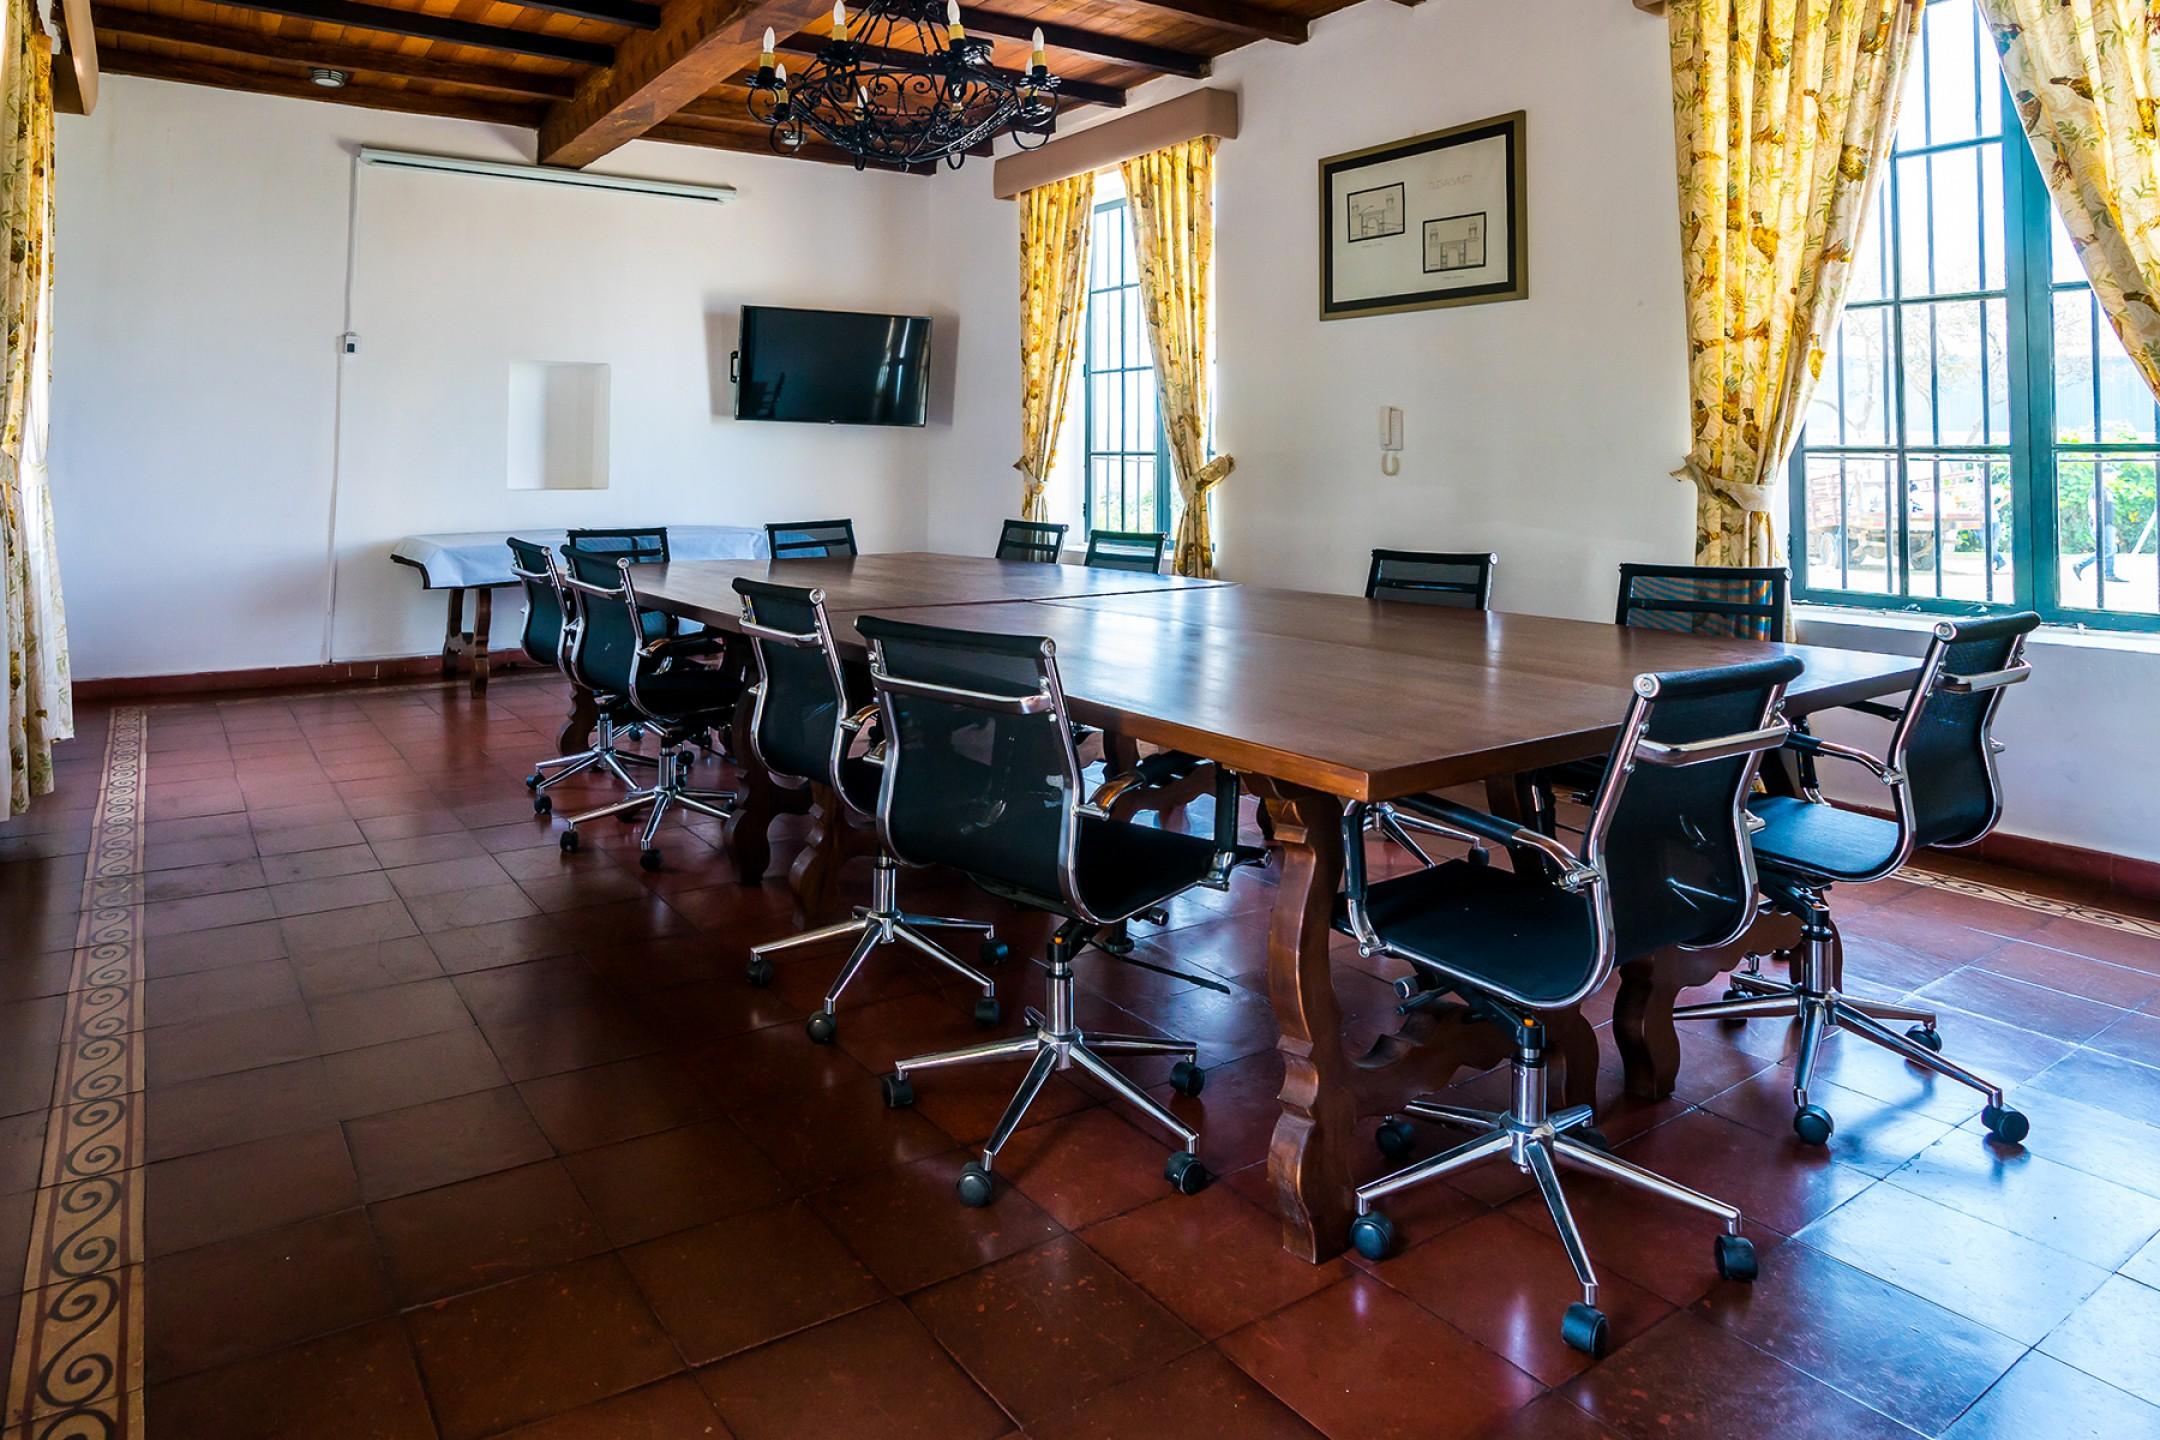 http://haciendabocanegra.com/images/chbn_PyvRasblTj_large-1080_0l21q.jpg